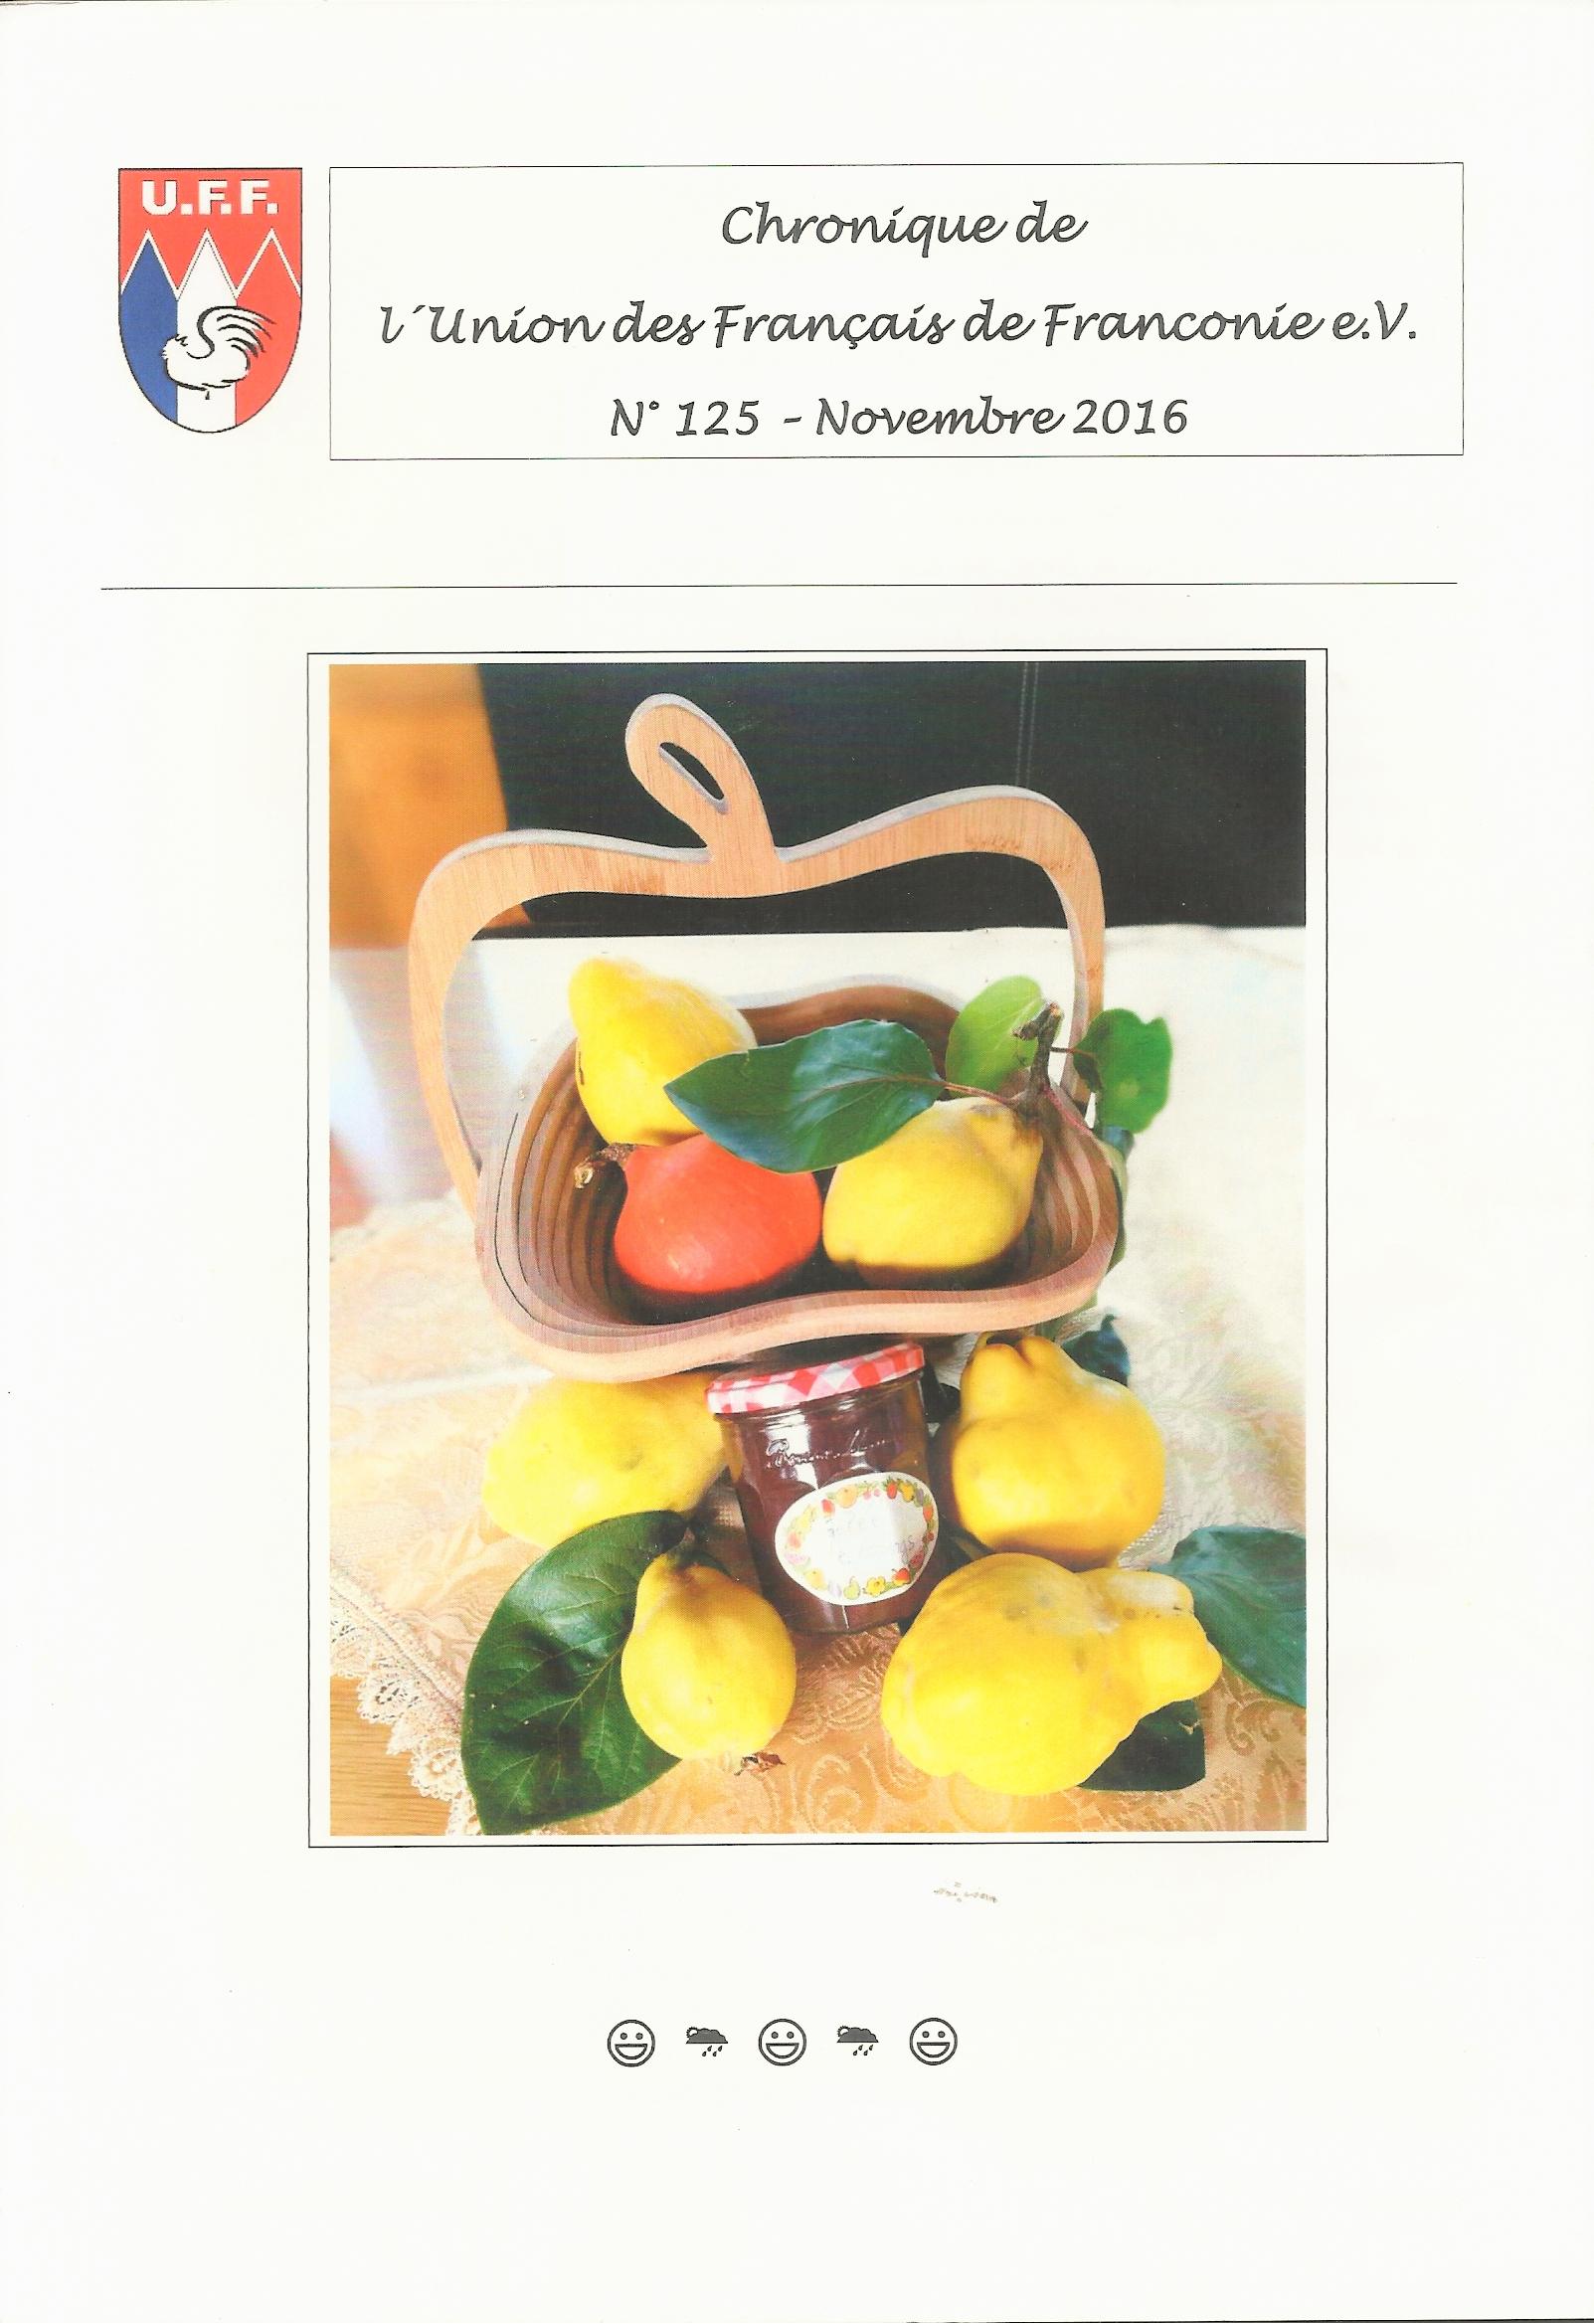 Chronique No 125 Novembre 2016